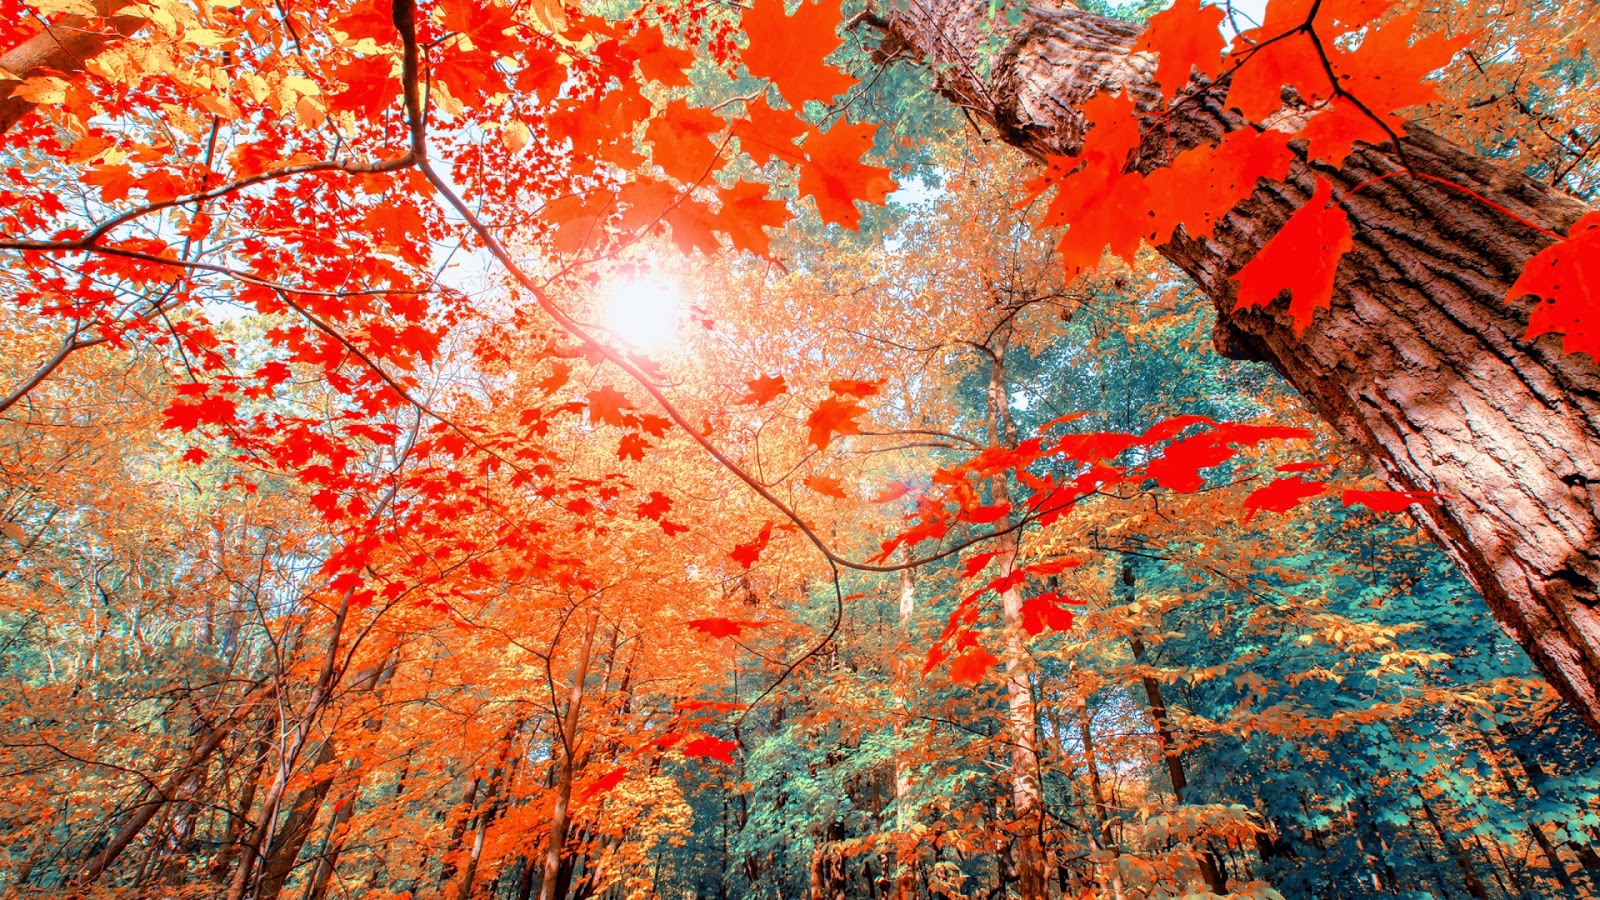 Autumn Hd Wallpaper 1080p 6